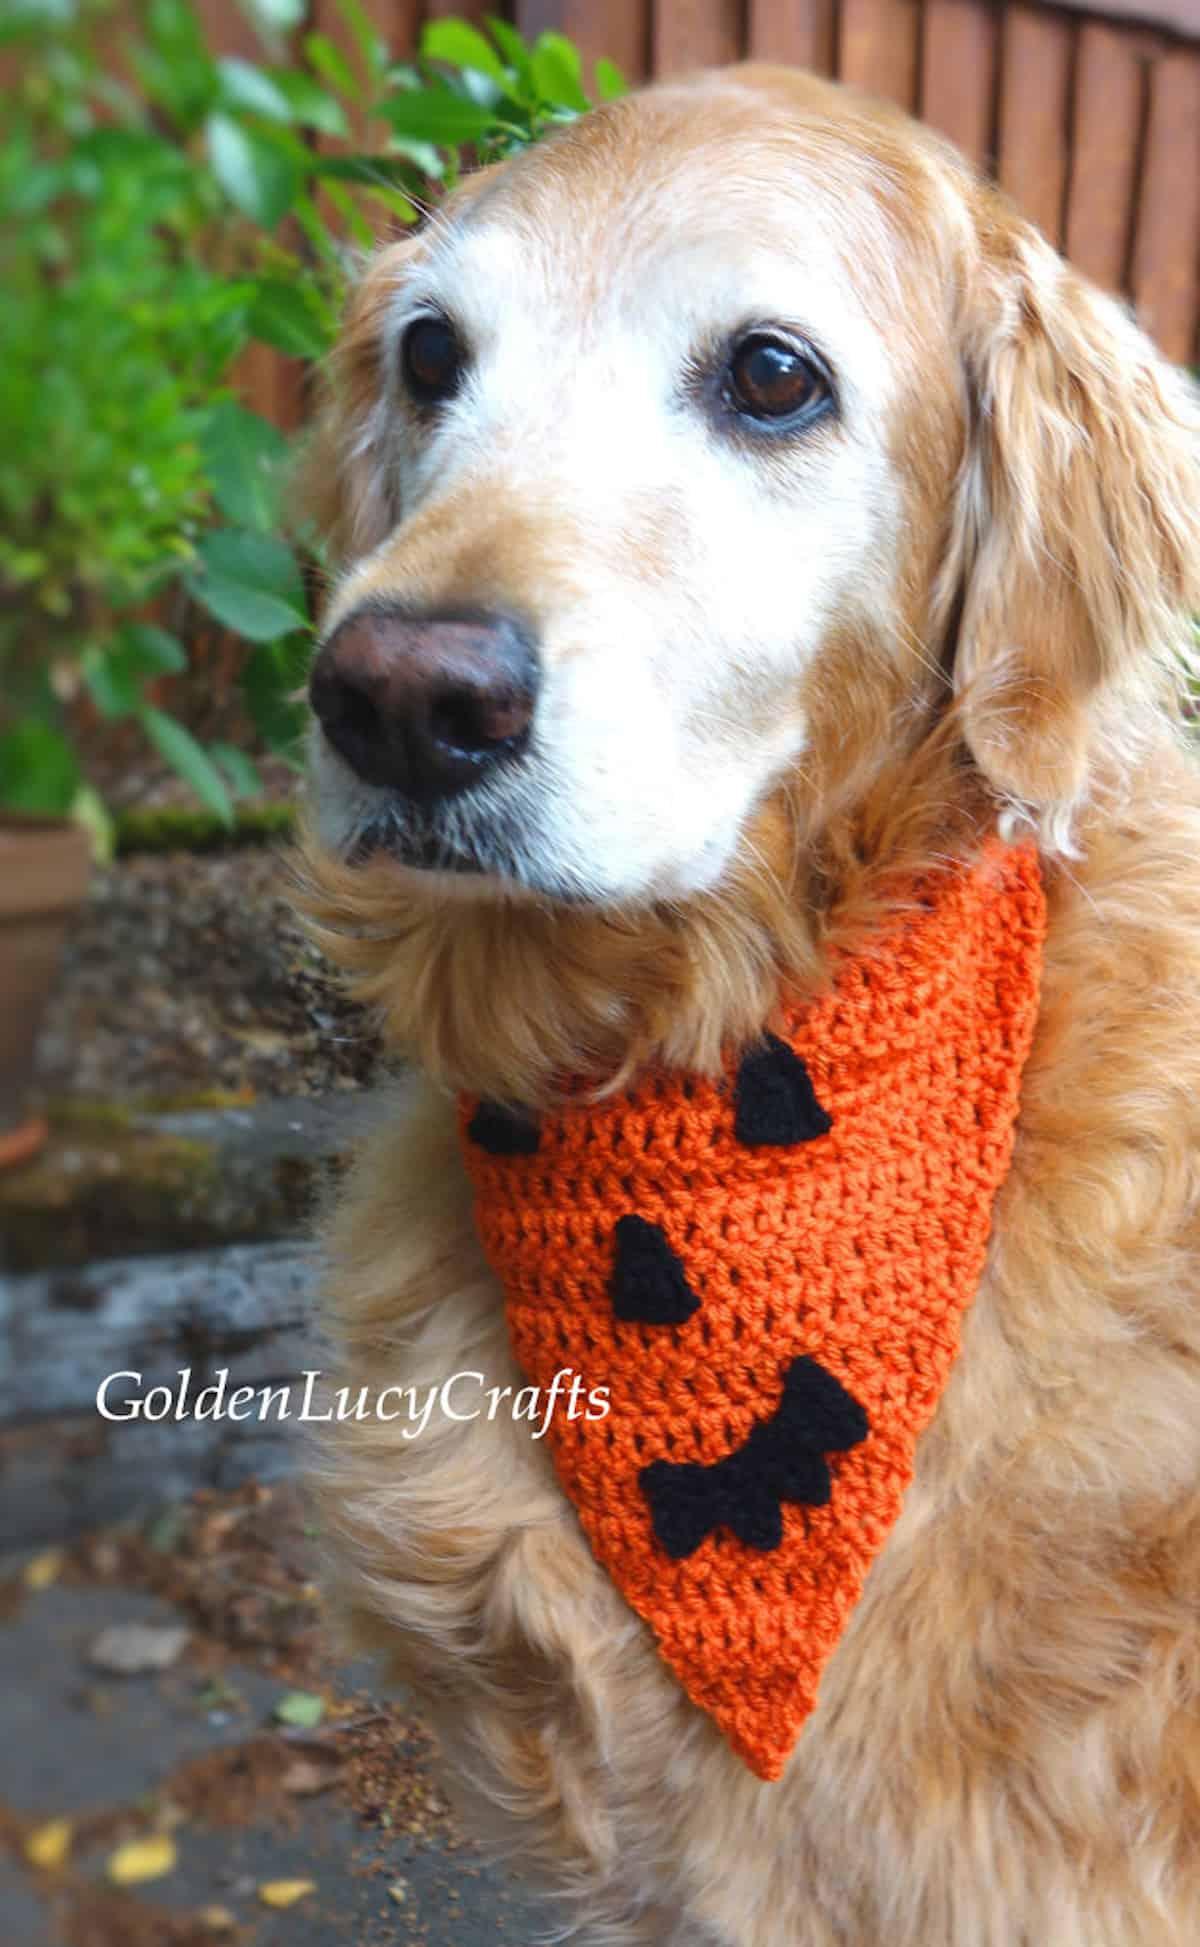 Golden retriever dressed in crochet Halloween bandana